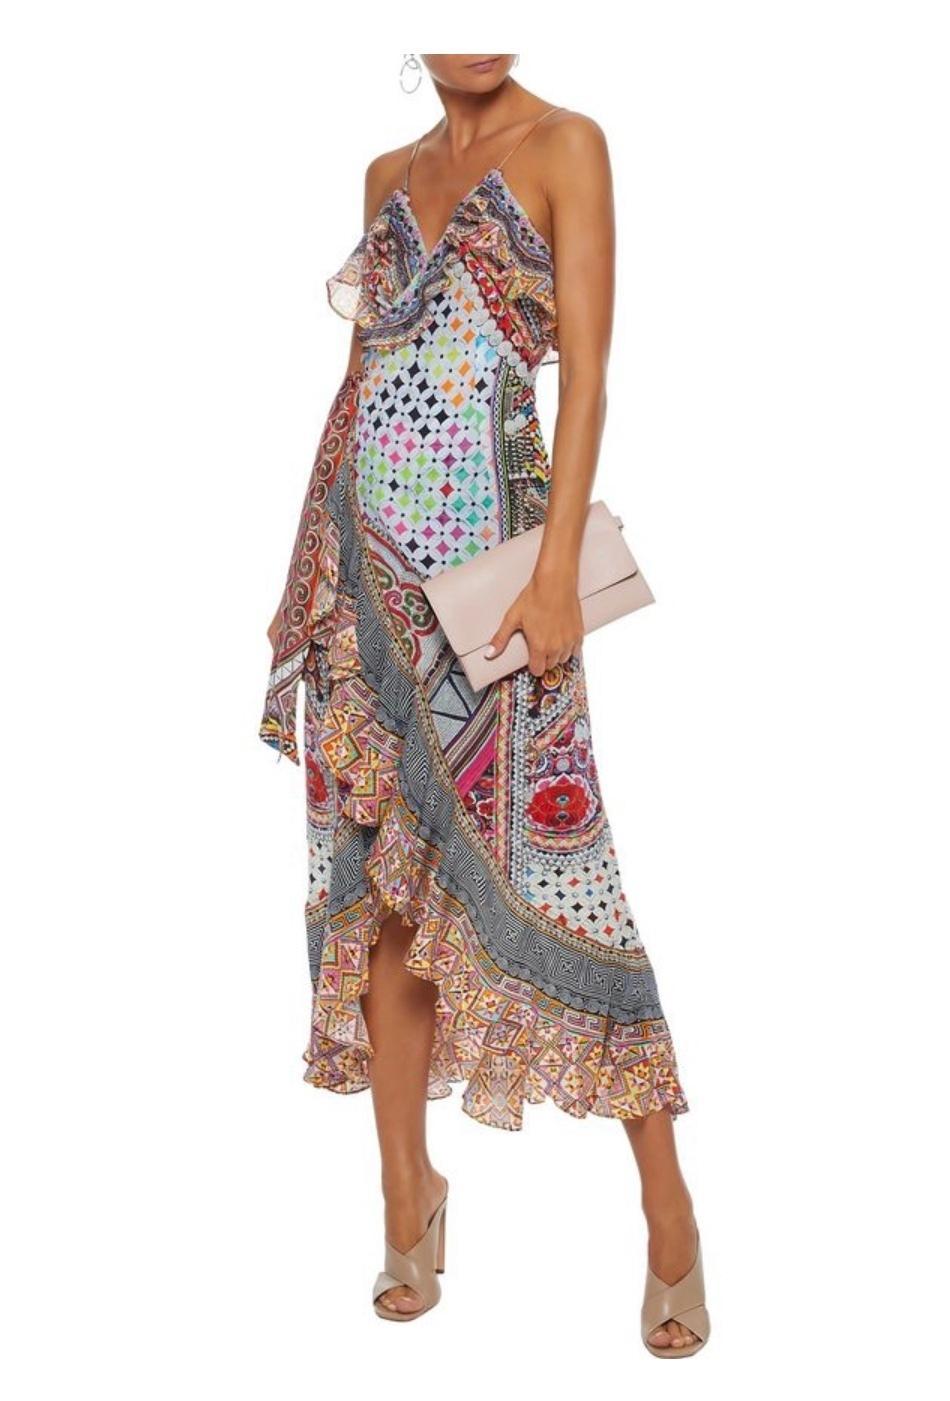 Camilla Girls Club Wrap Dress Size 12 The Volte